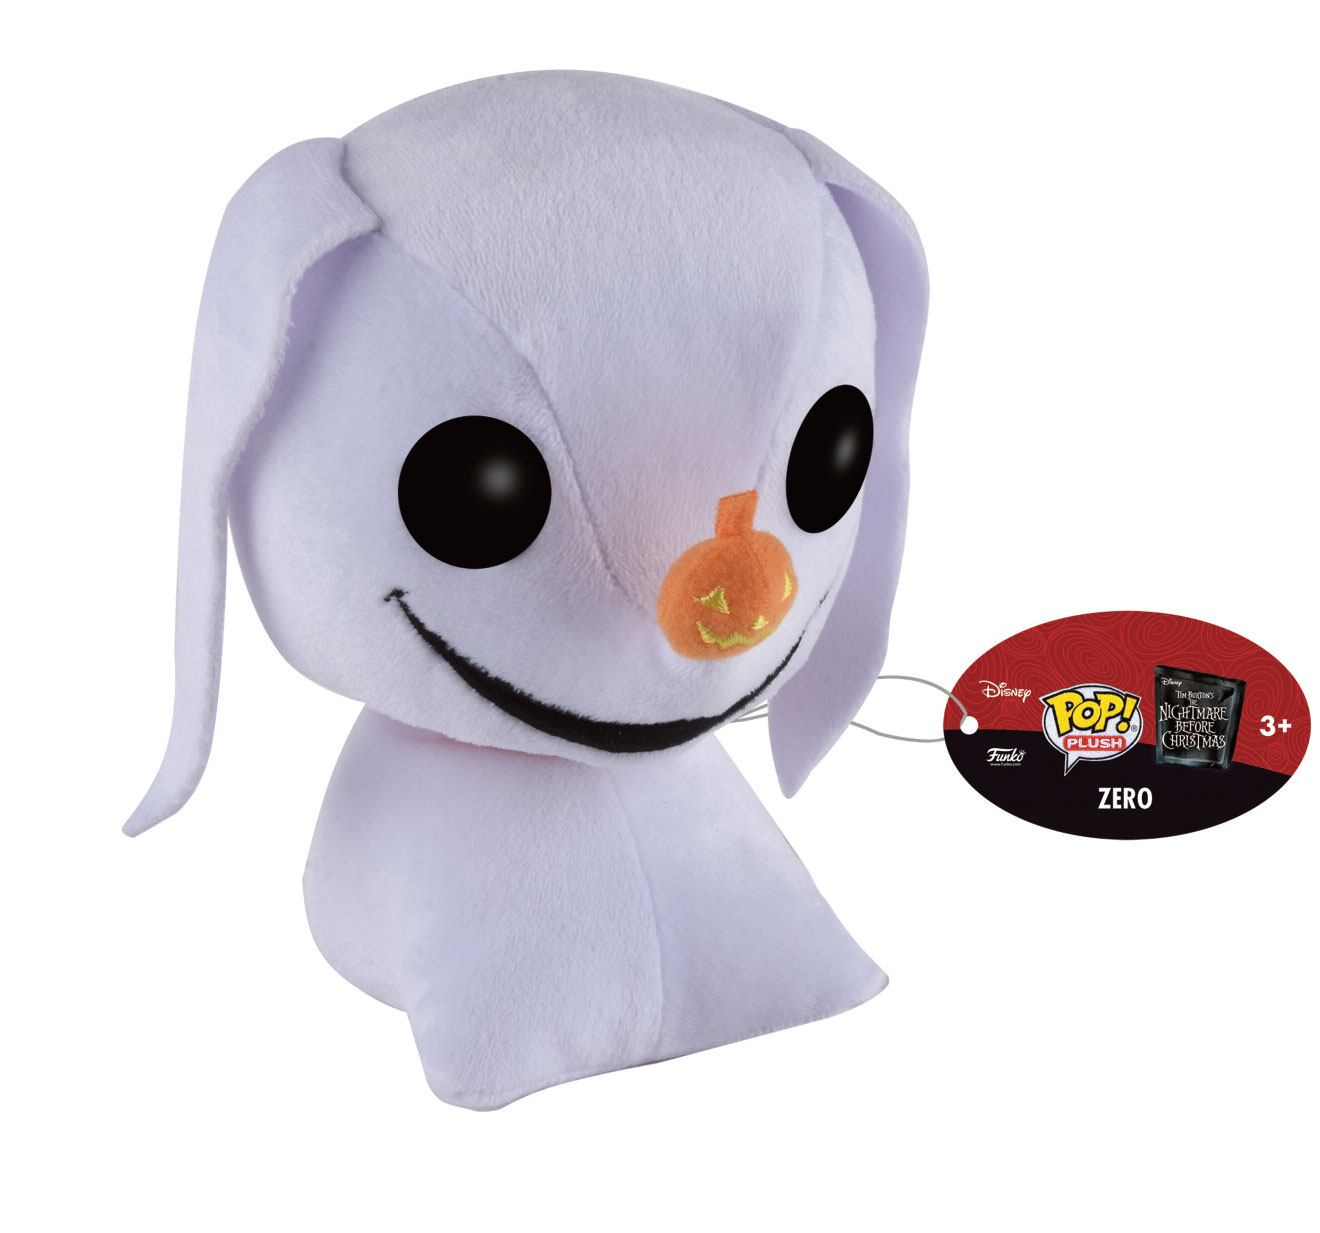 Nightmare Before Christmas POP! Plush Figure Zero 15 cm